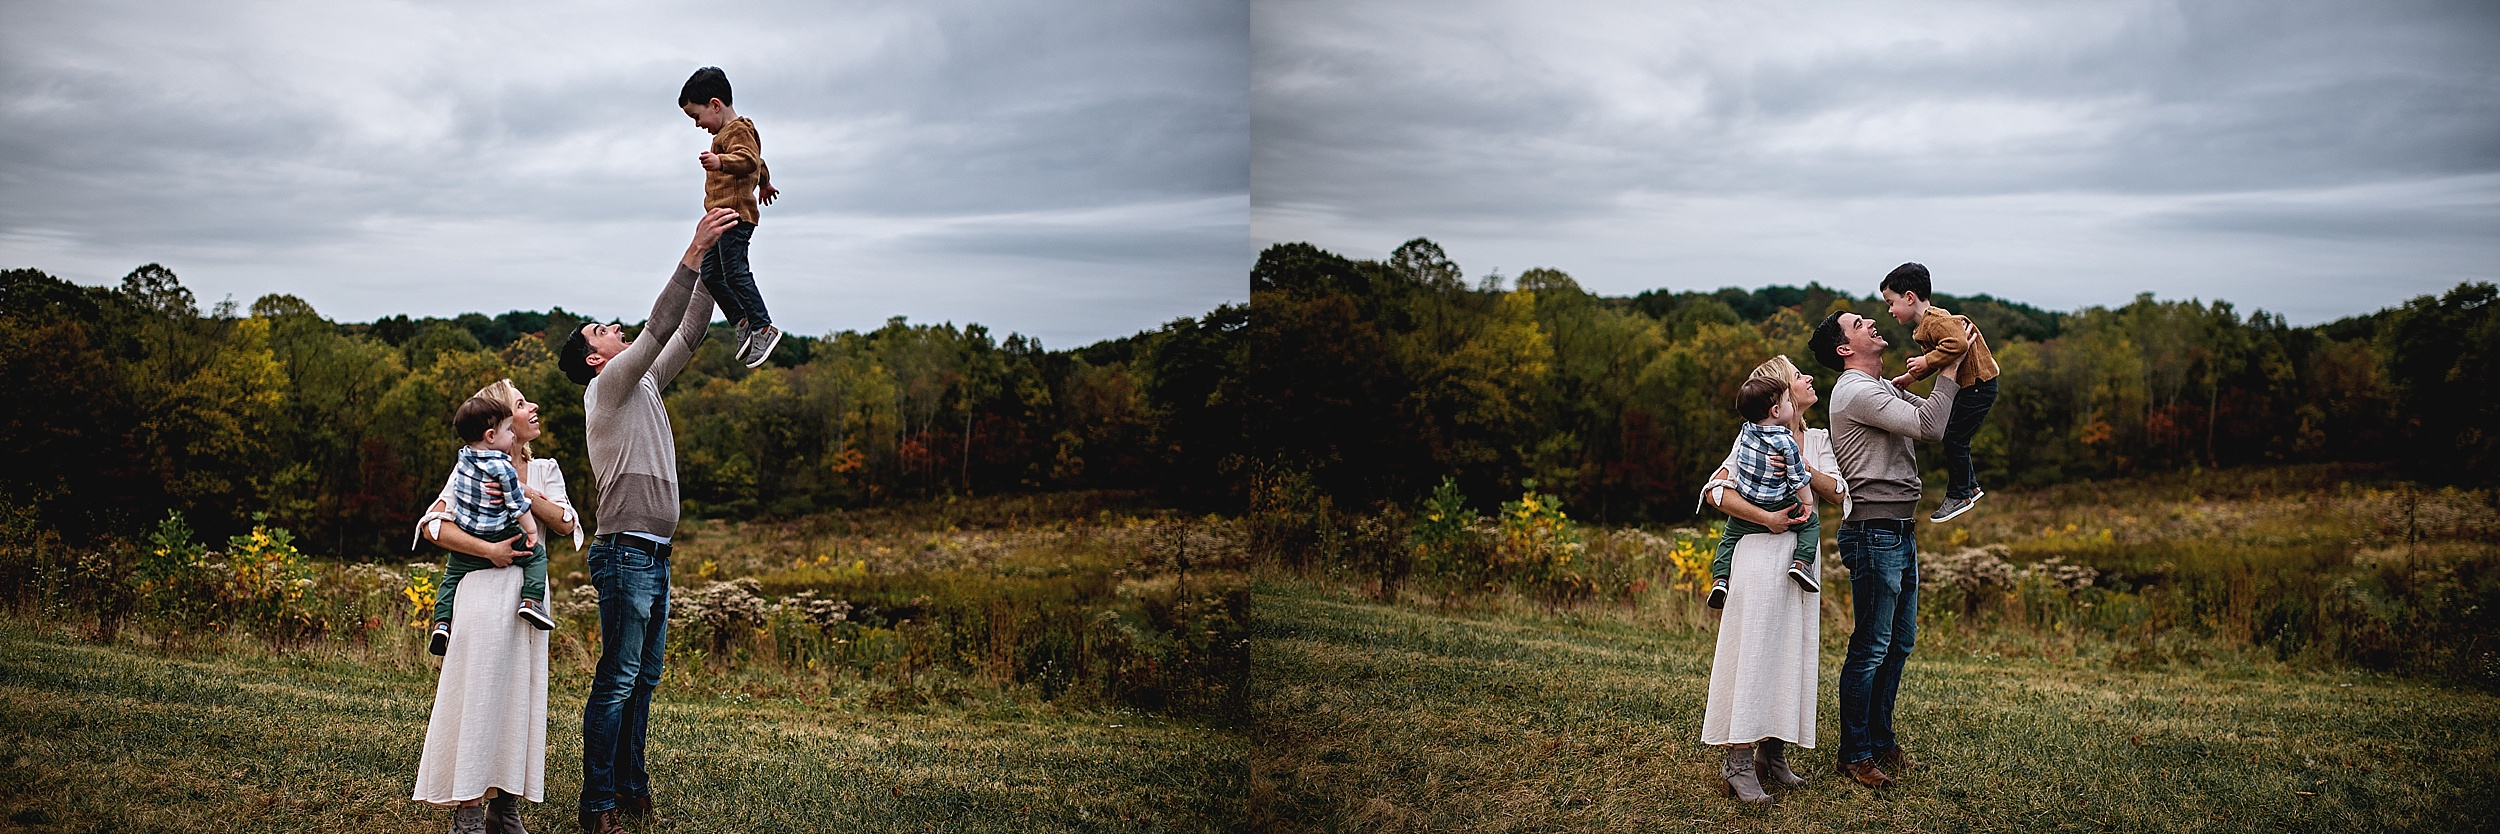 lauren-grayson-photography-portrait-artist-akron-cleveland-ohio-photographer-family-session-fields-sunset-fall_0207.jpg